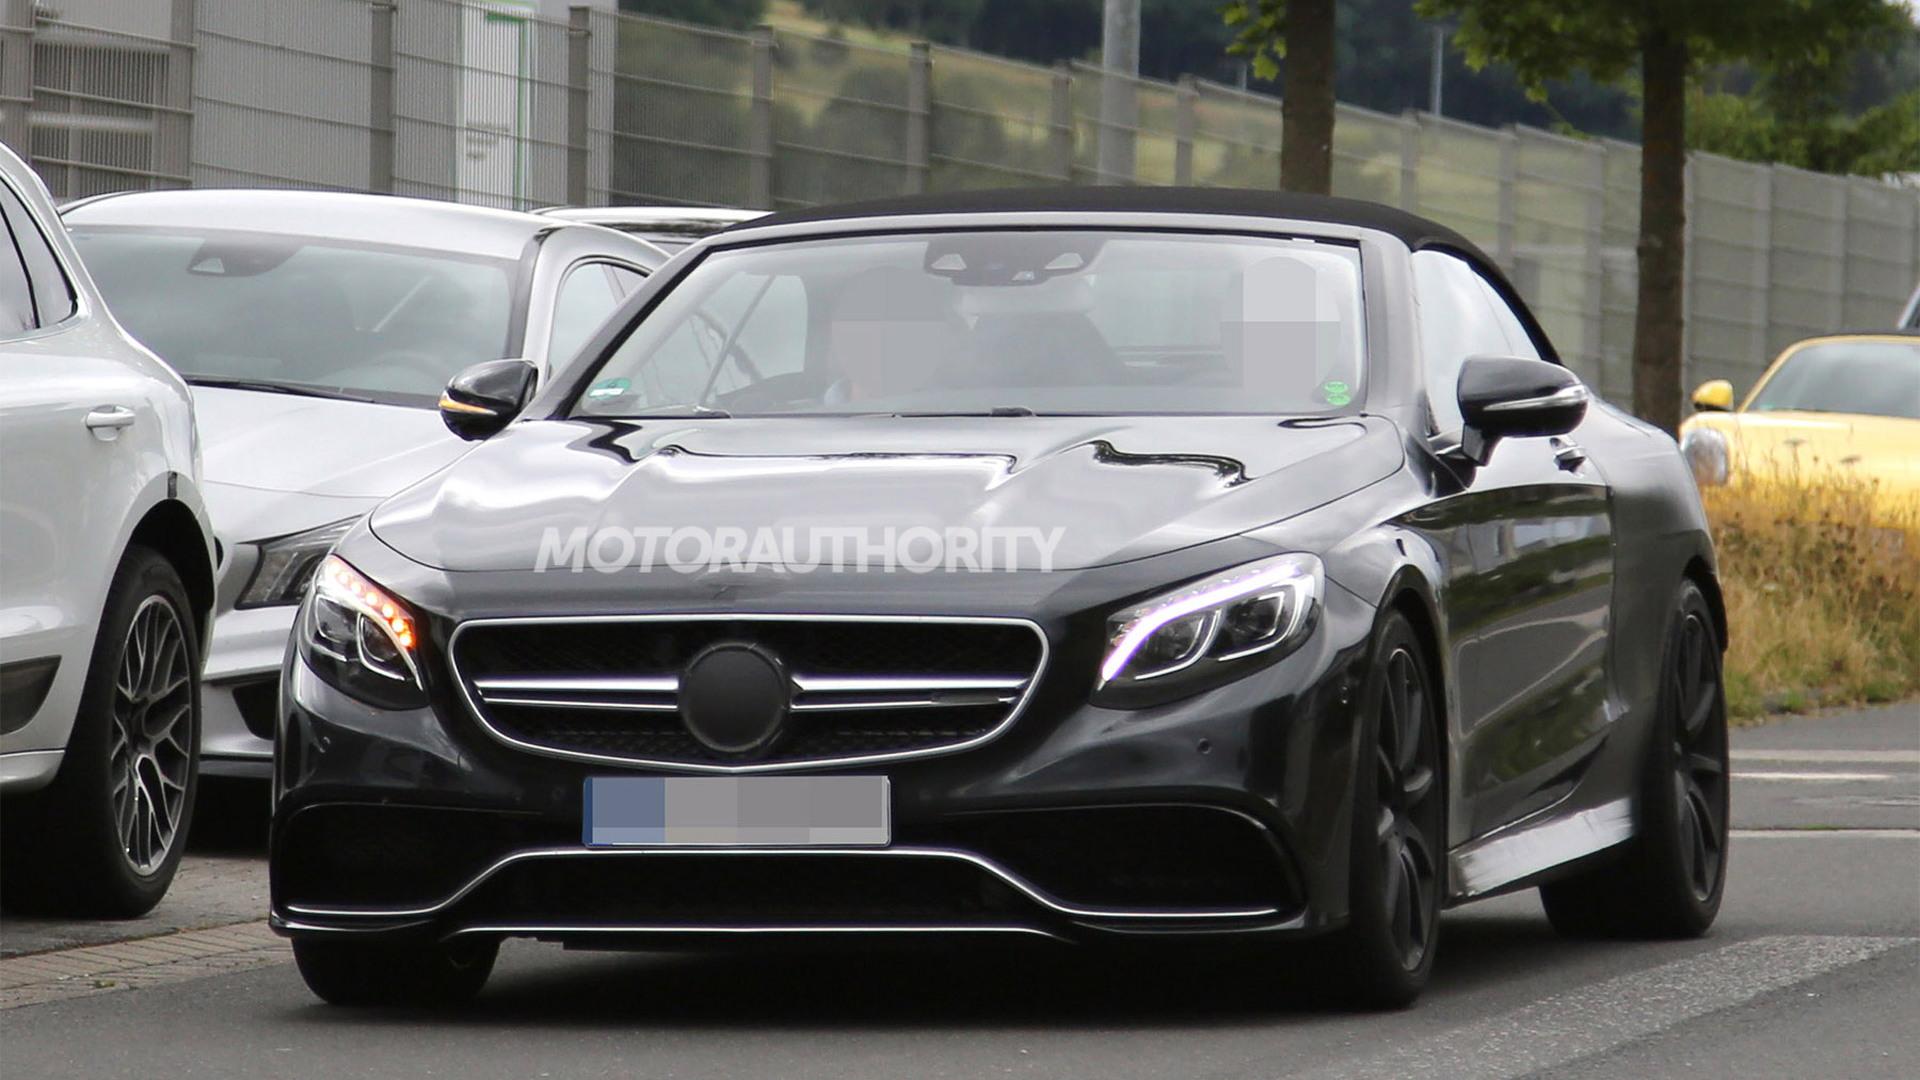 2017 Mercedes-AMG S63 Cabriolet spy shots - Image via S. Baldauf/SB-Medien